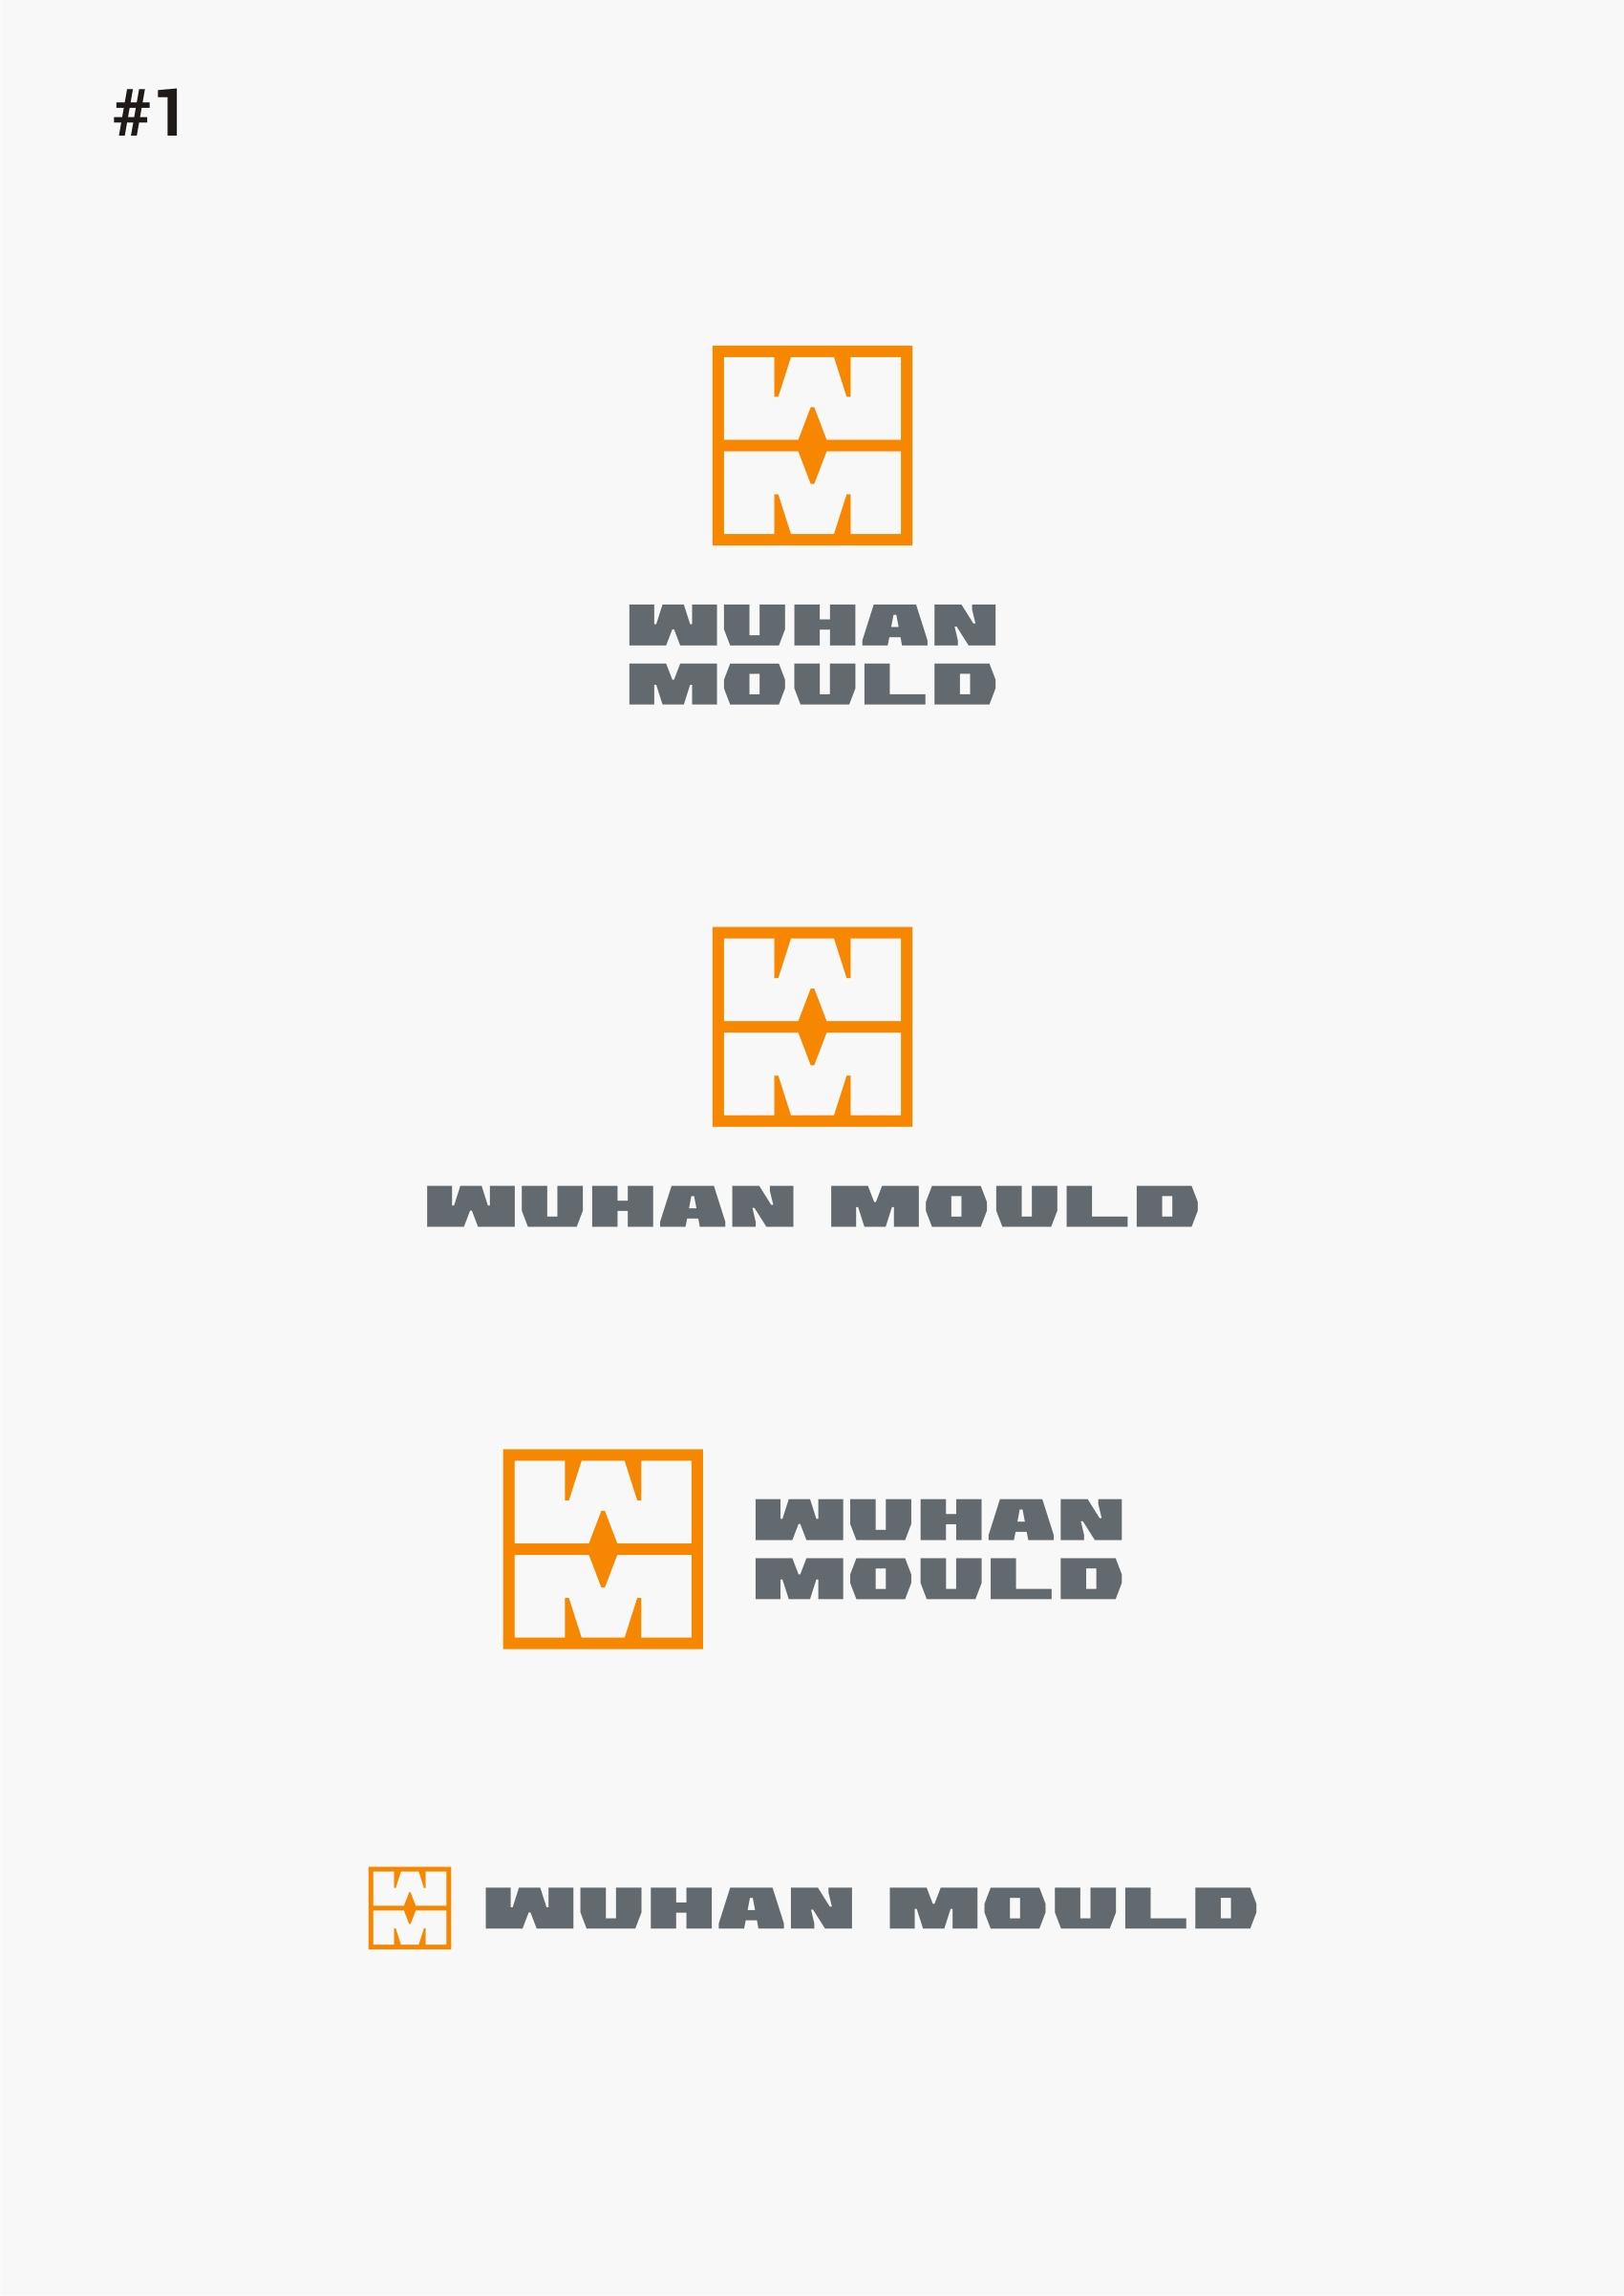 Создать логотип для фабрики пресс-форм фото f_053599a60f55bcb0.jpg